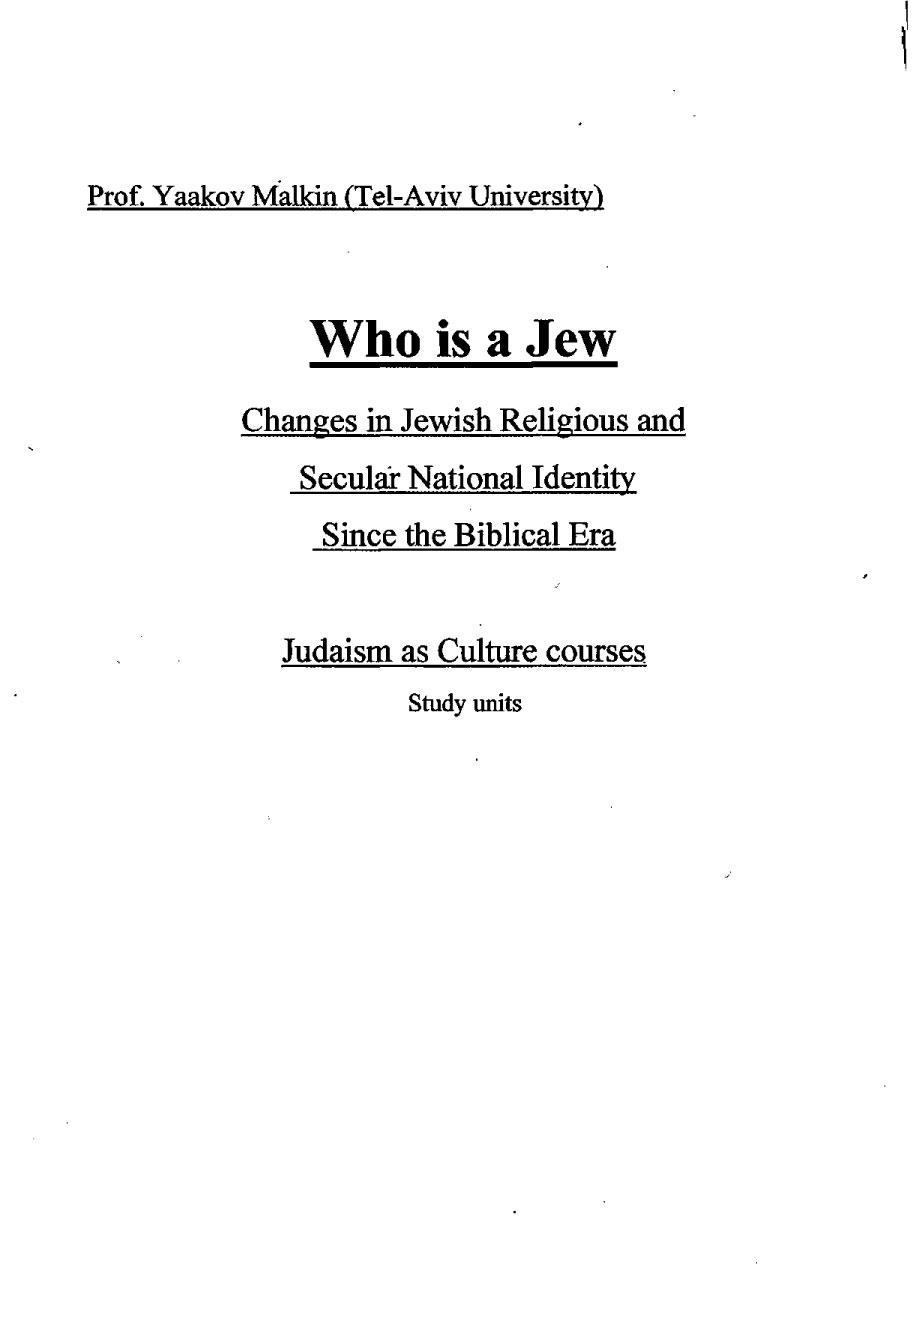 who is a jew - Yaakov Malkin, English, 2006